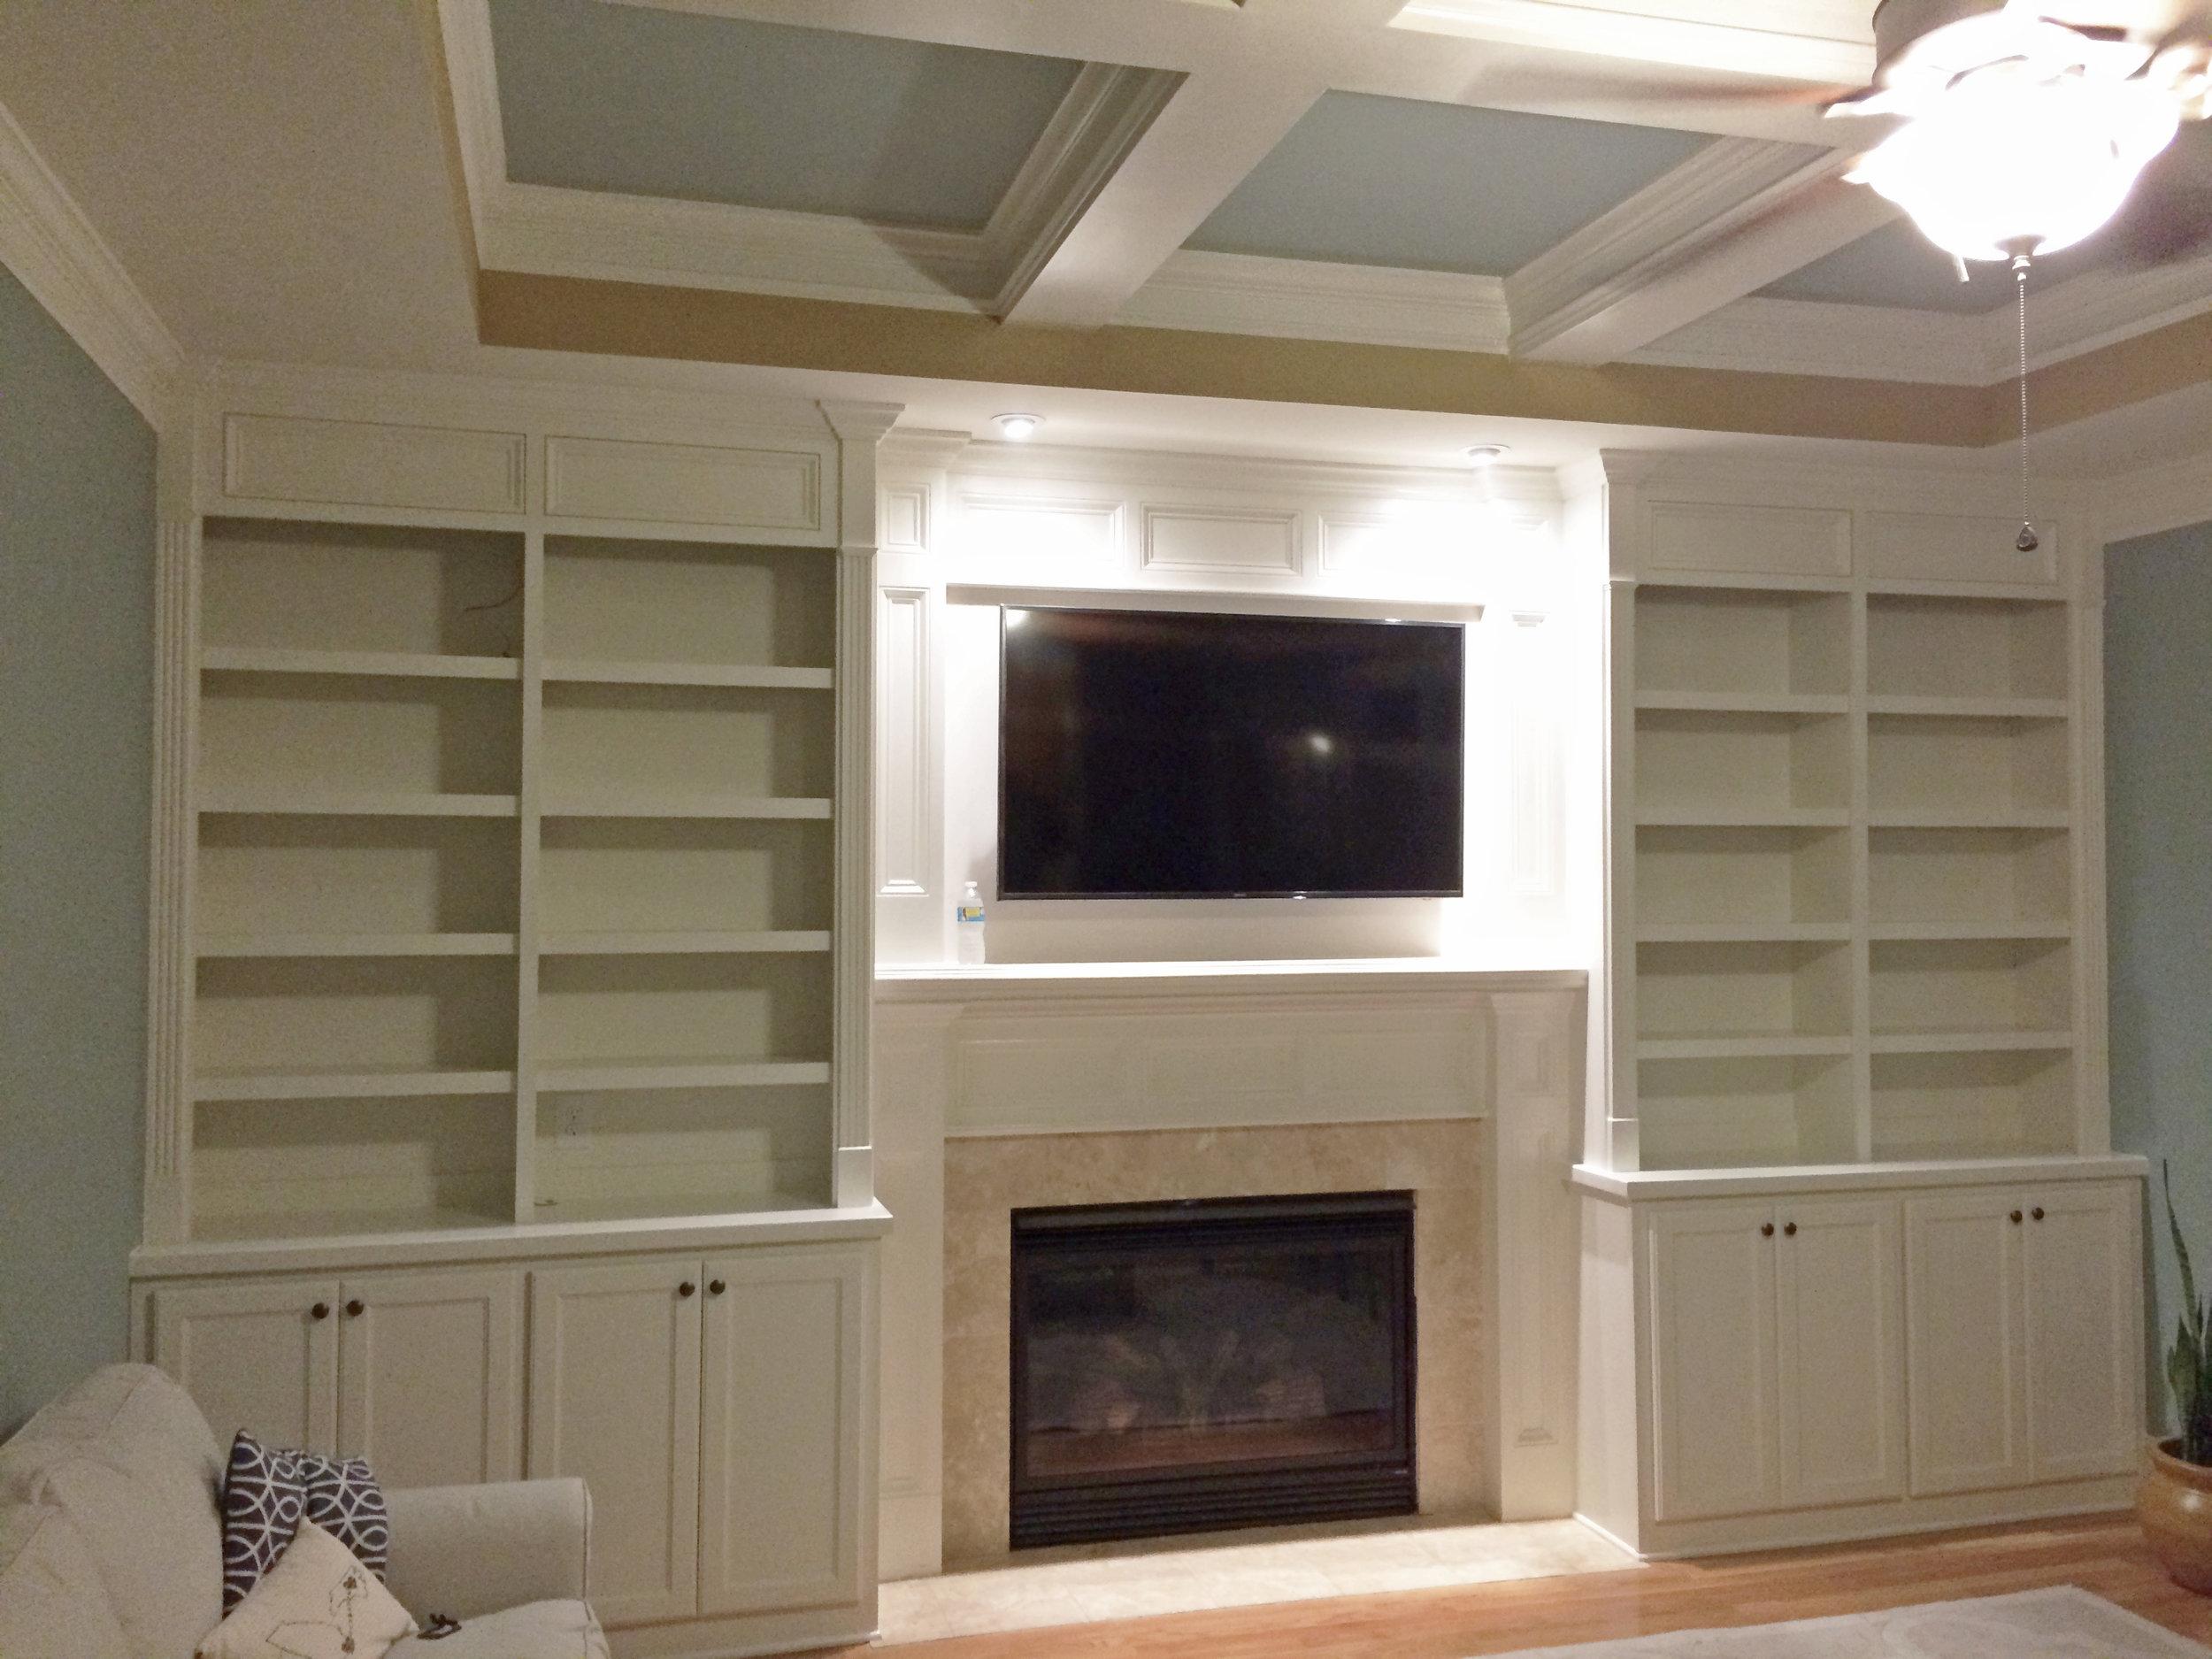 Fireplace Built-Ins - After